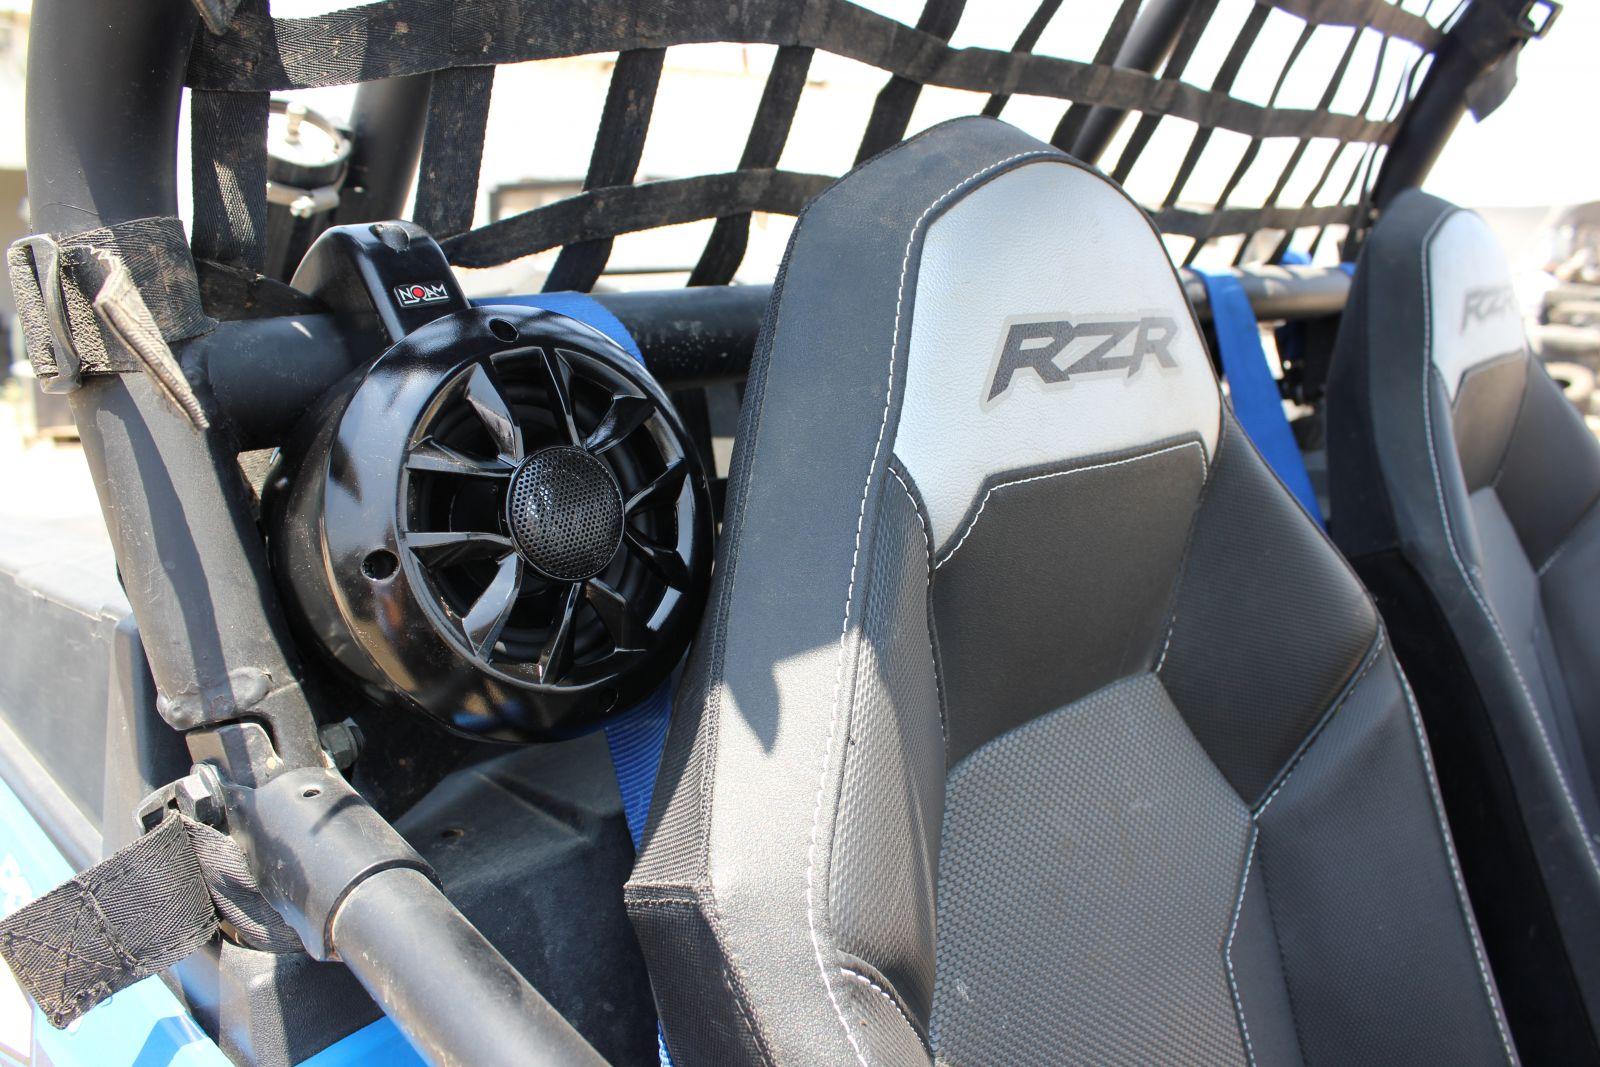 Way waterproof speakers roll bar mount for utv atv golf cart wakeboard